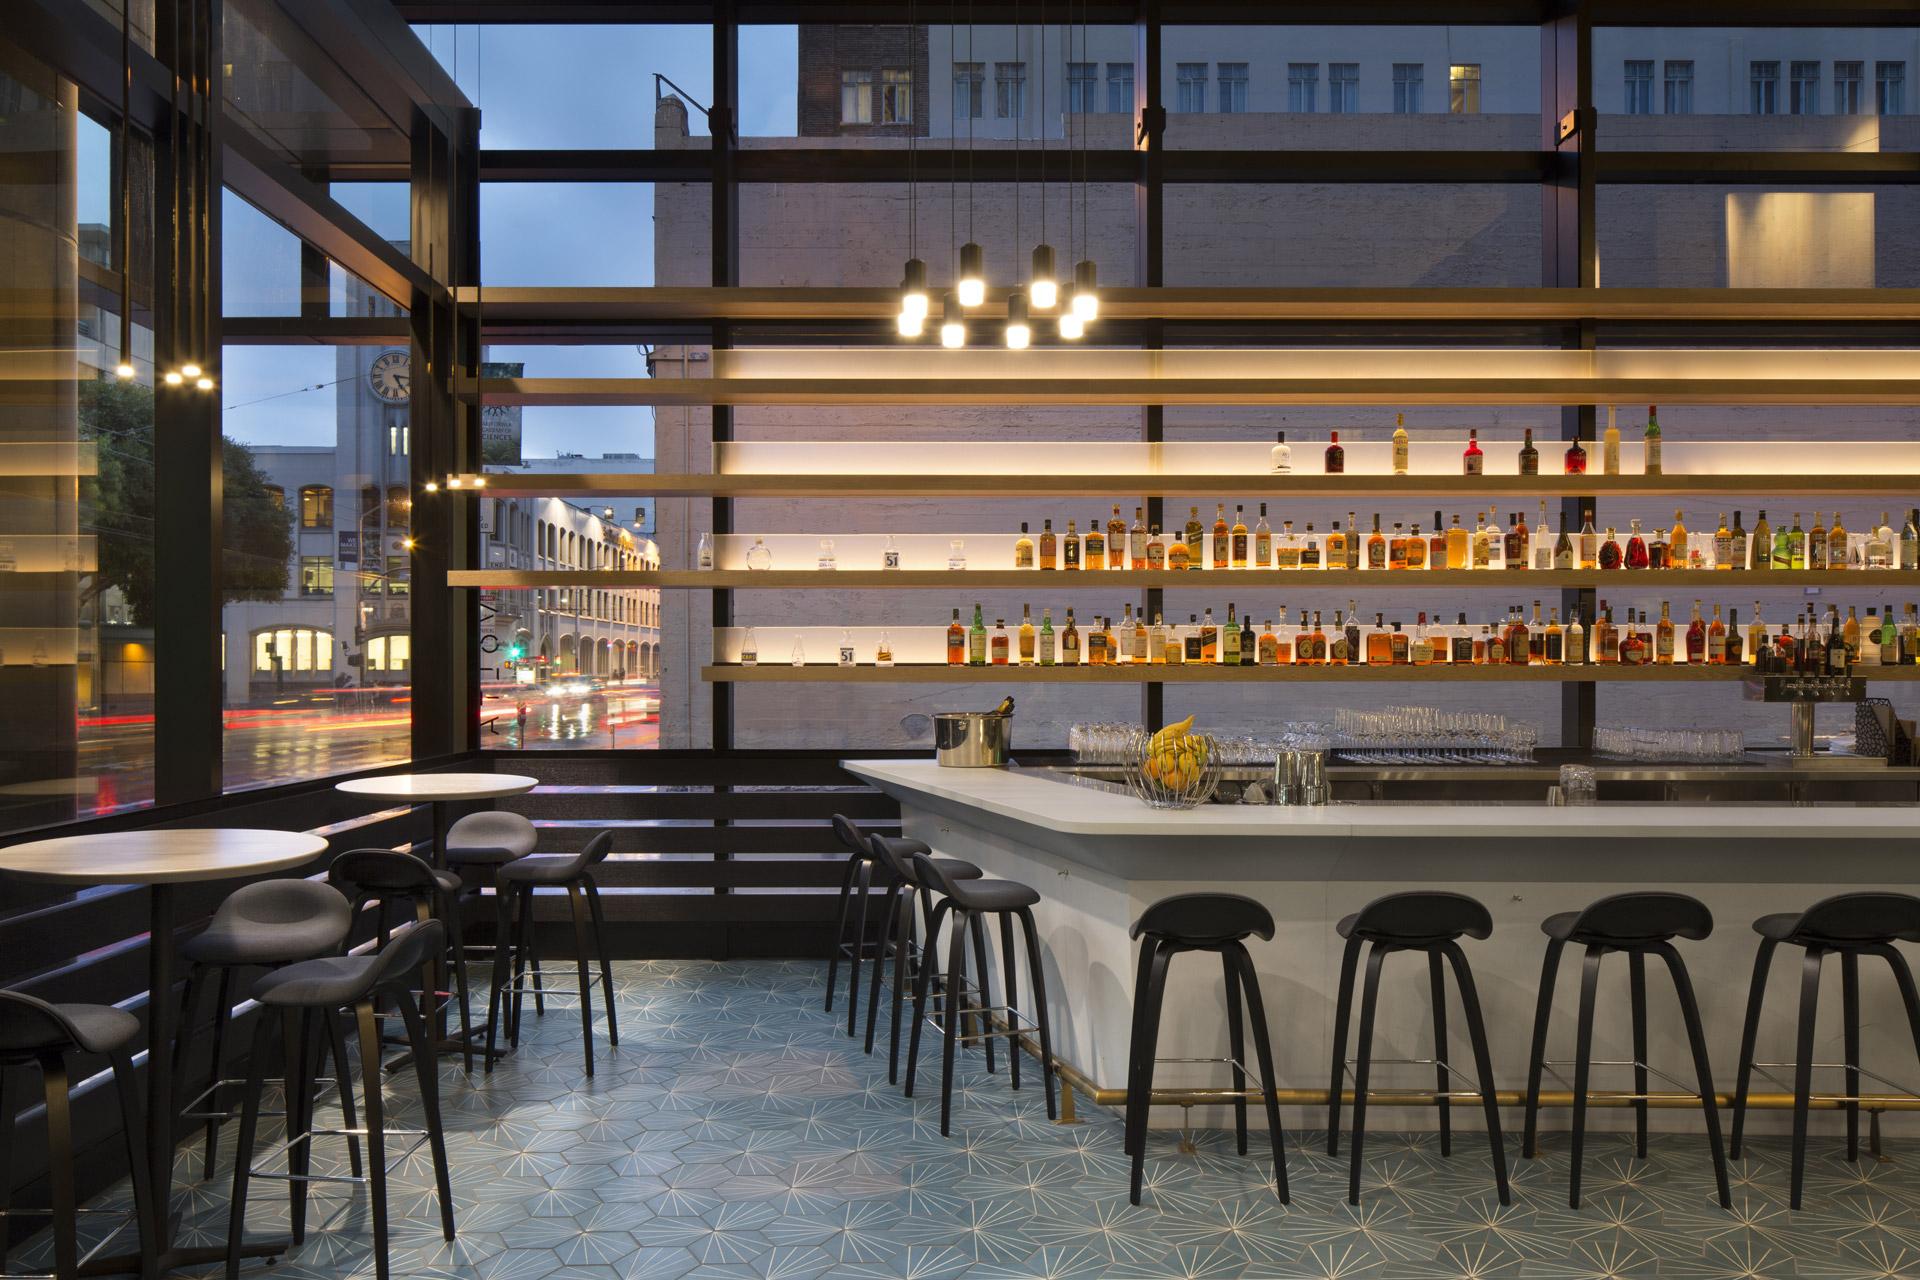 Volta restaurant architecture